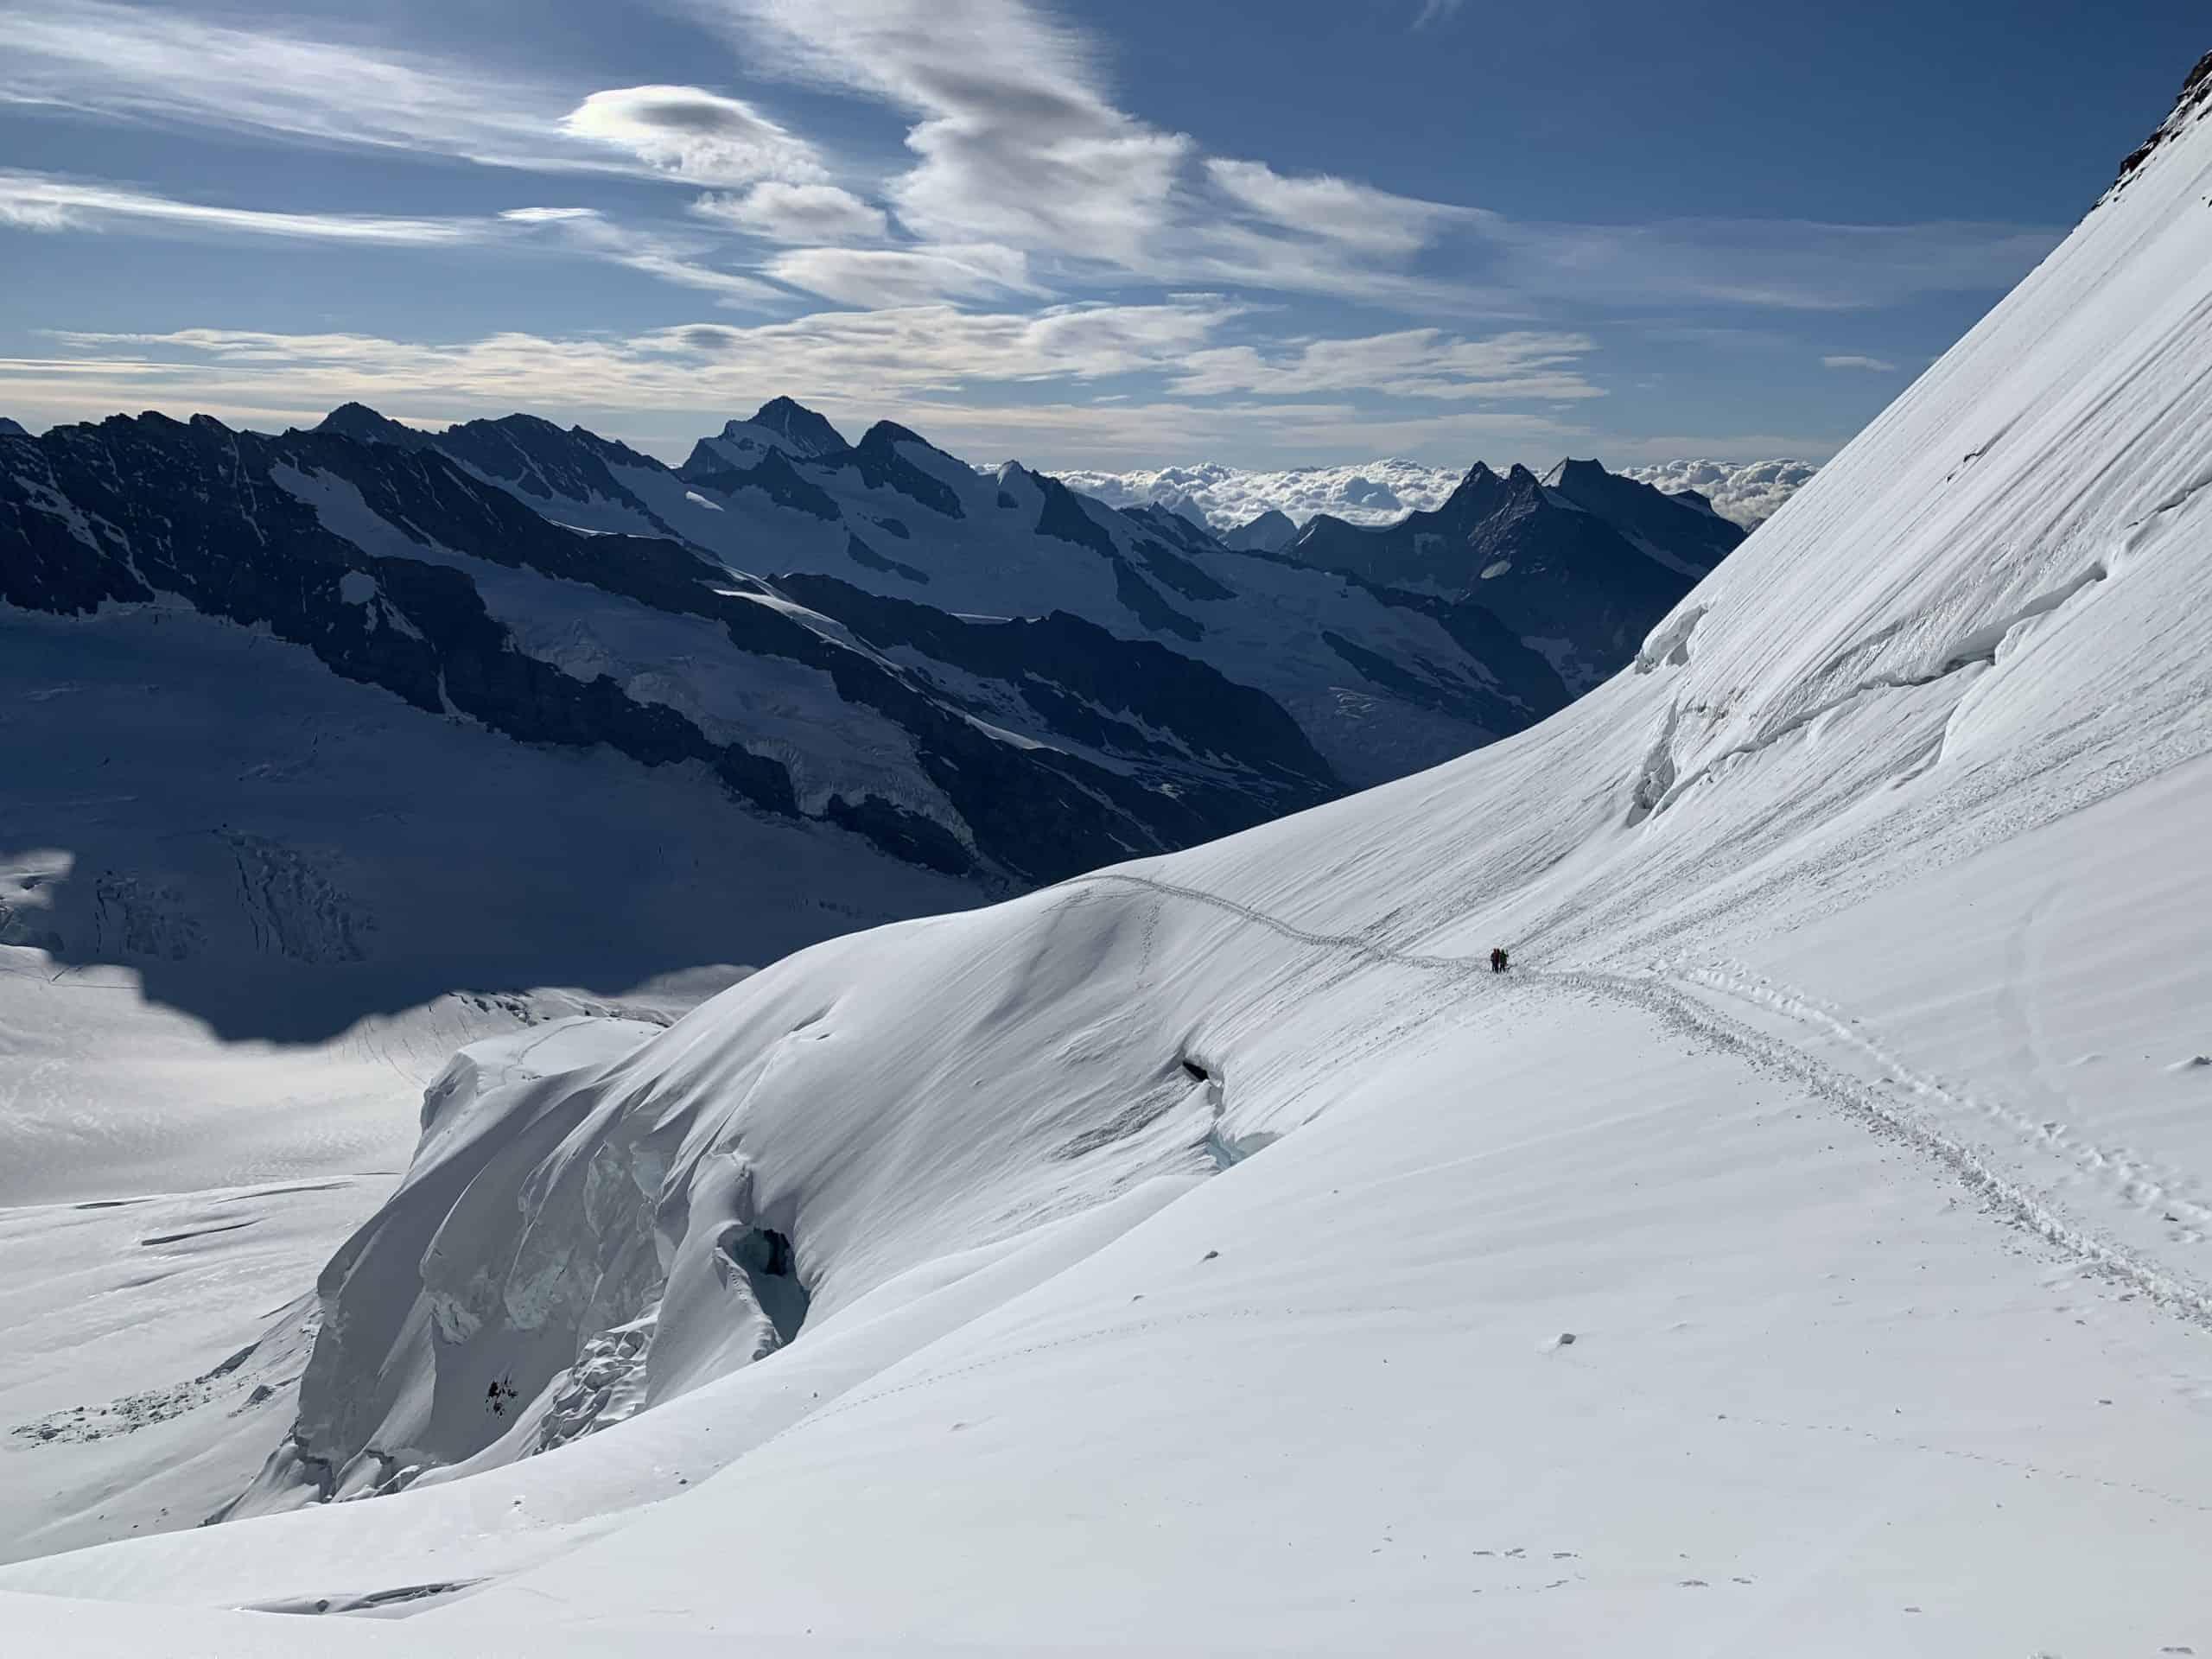 IMG 3862 scaled - Jungfrau - der Star im Berner Oberland